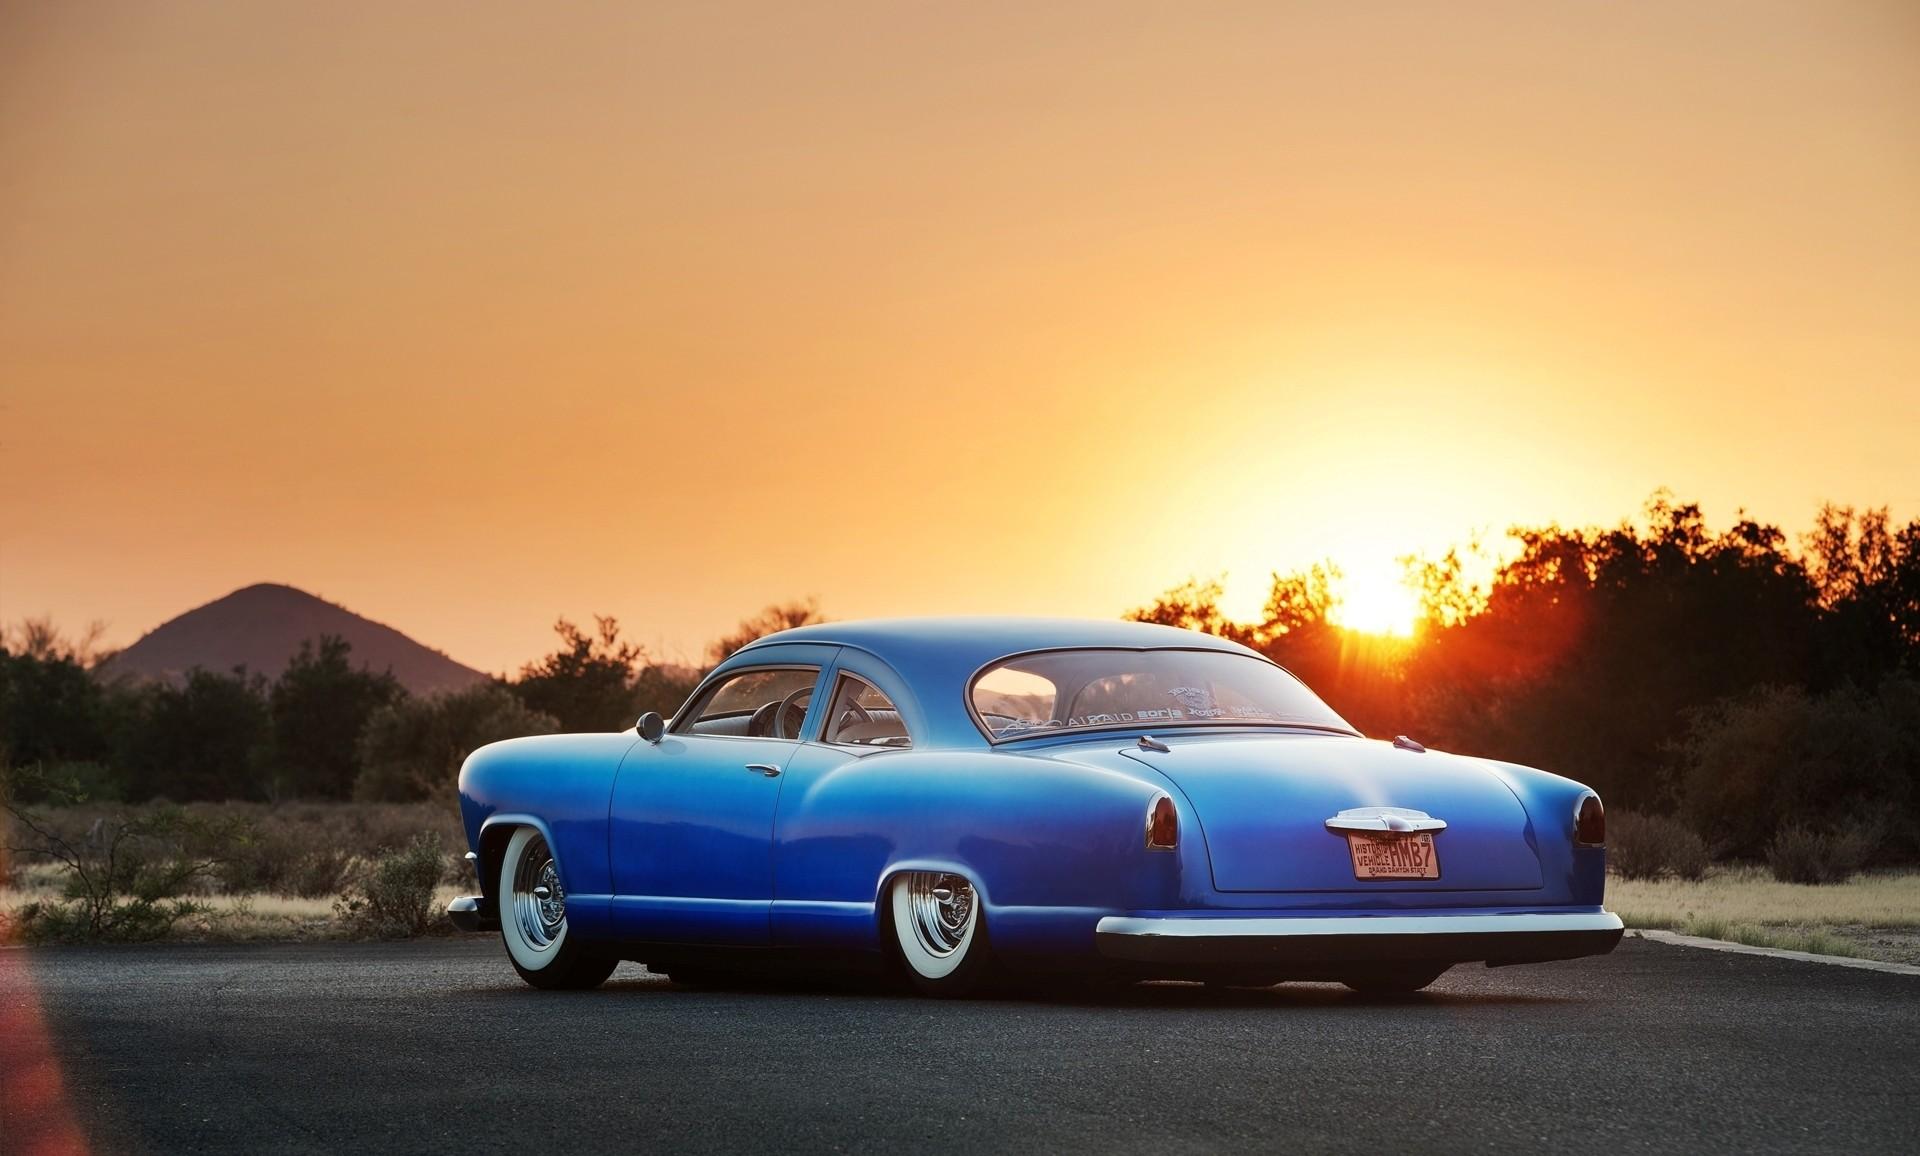 Res: 1920x1156, Classic Lowrider Car